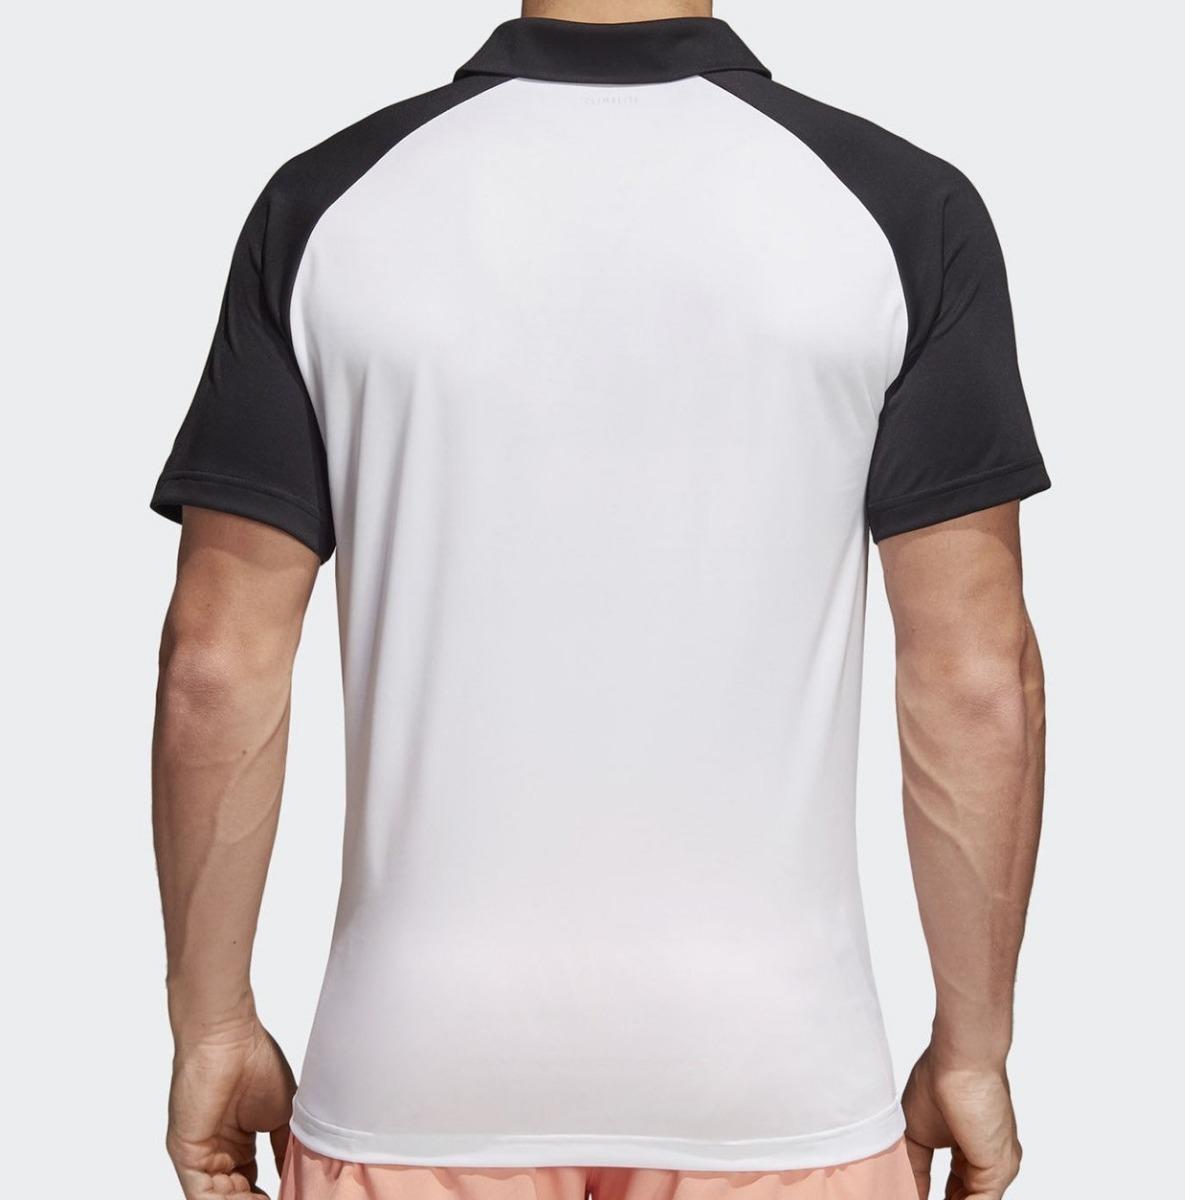 camisa polo colorblock club adidas preta e branca. Carregando zoom. 99ee7e476a0df